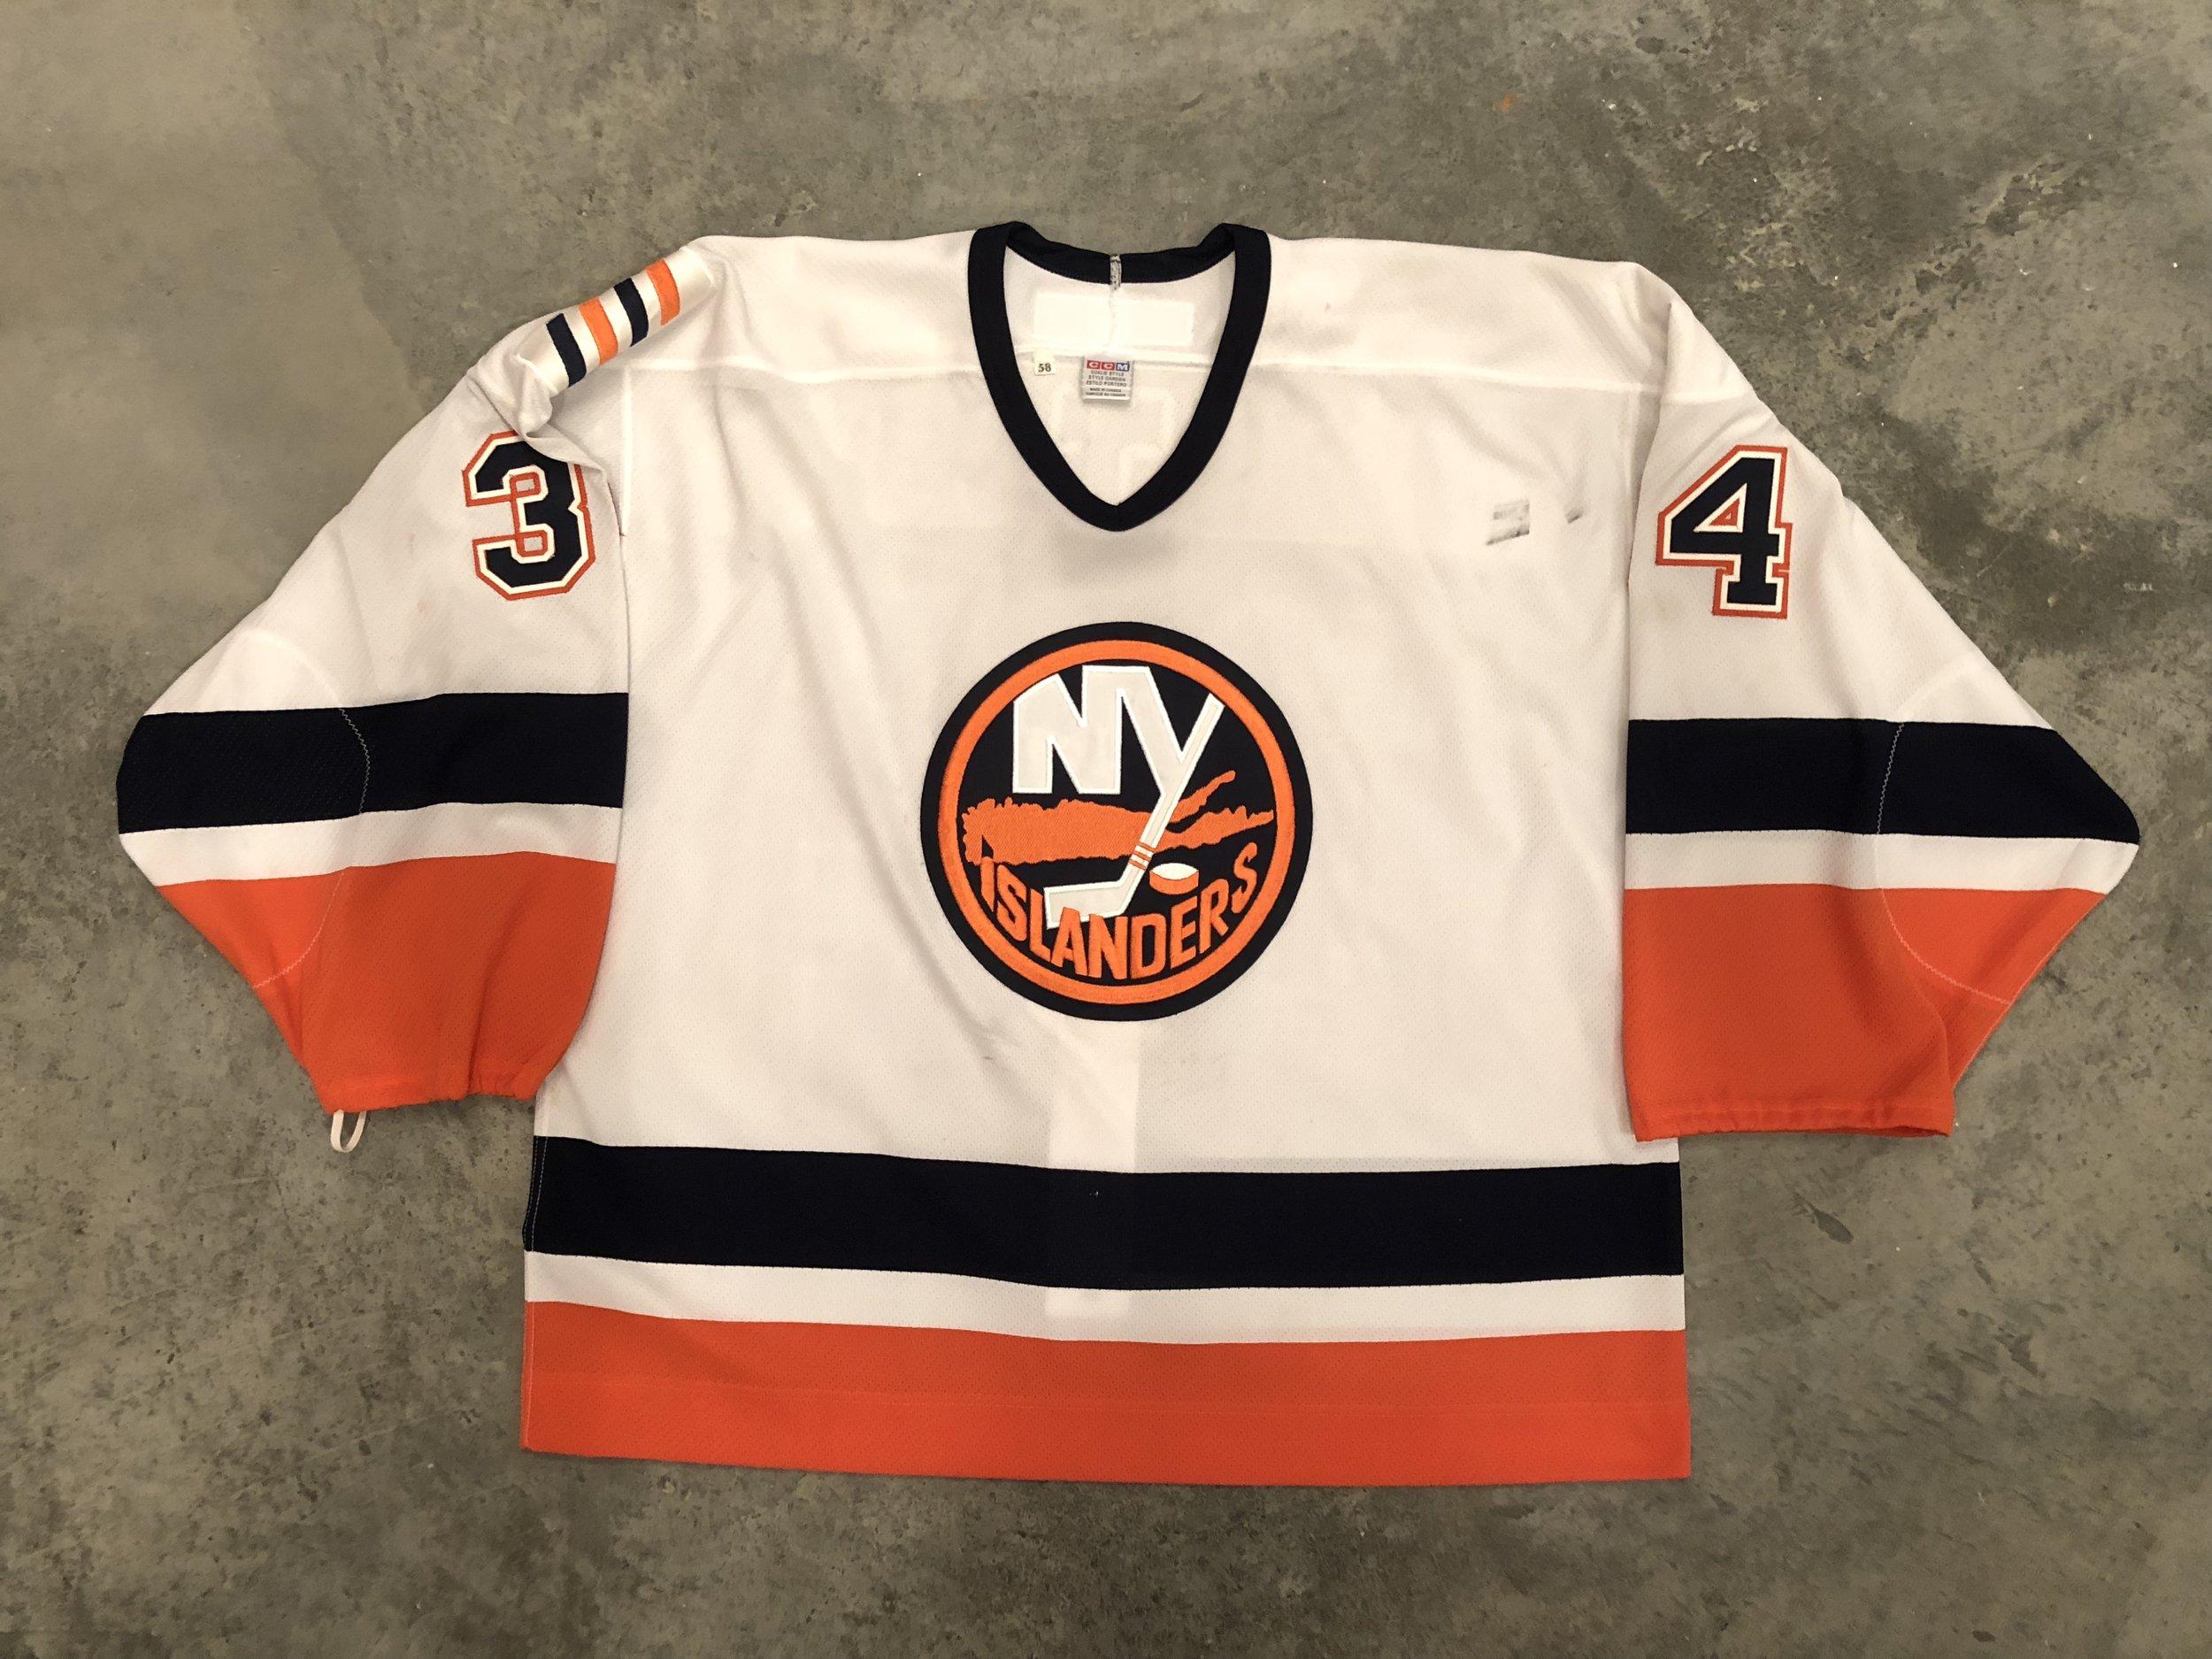 2000-01 New York Islanders game worn home jersey